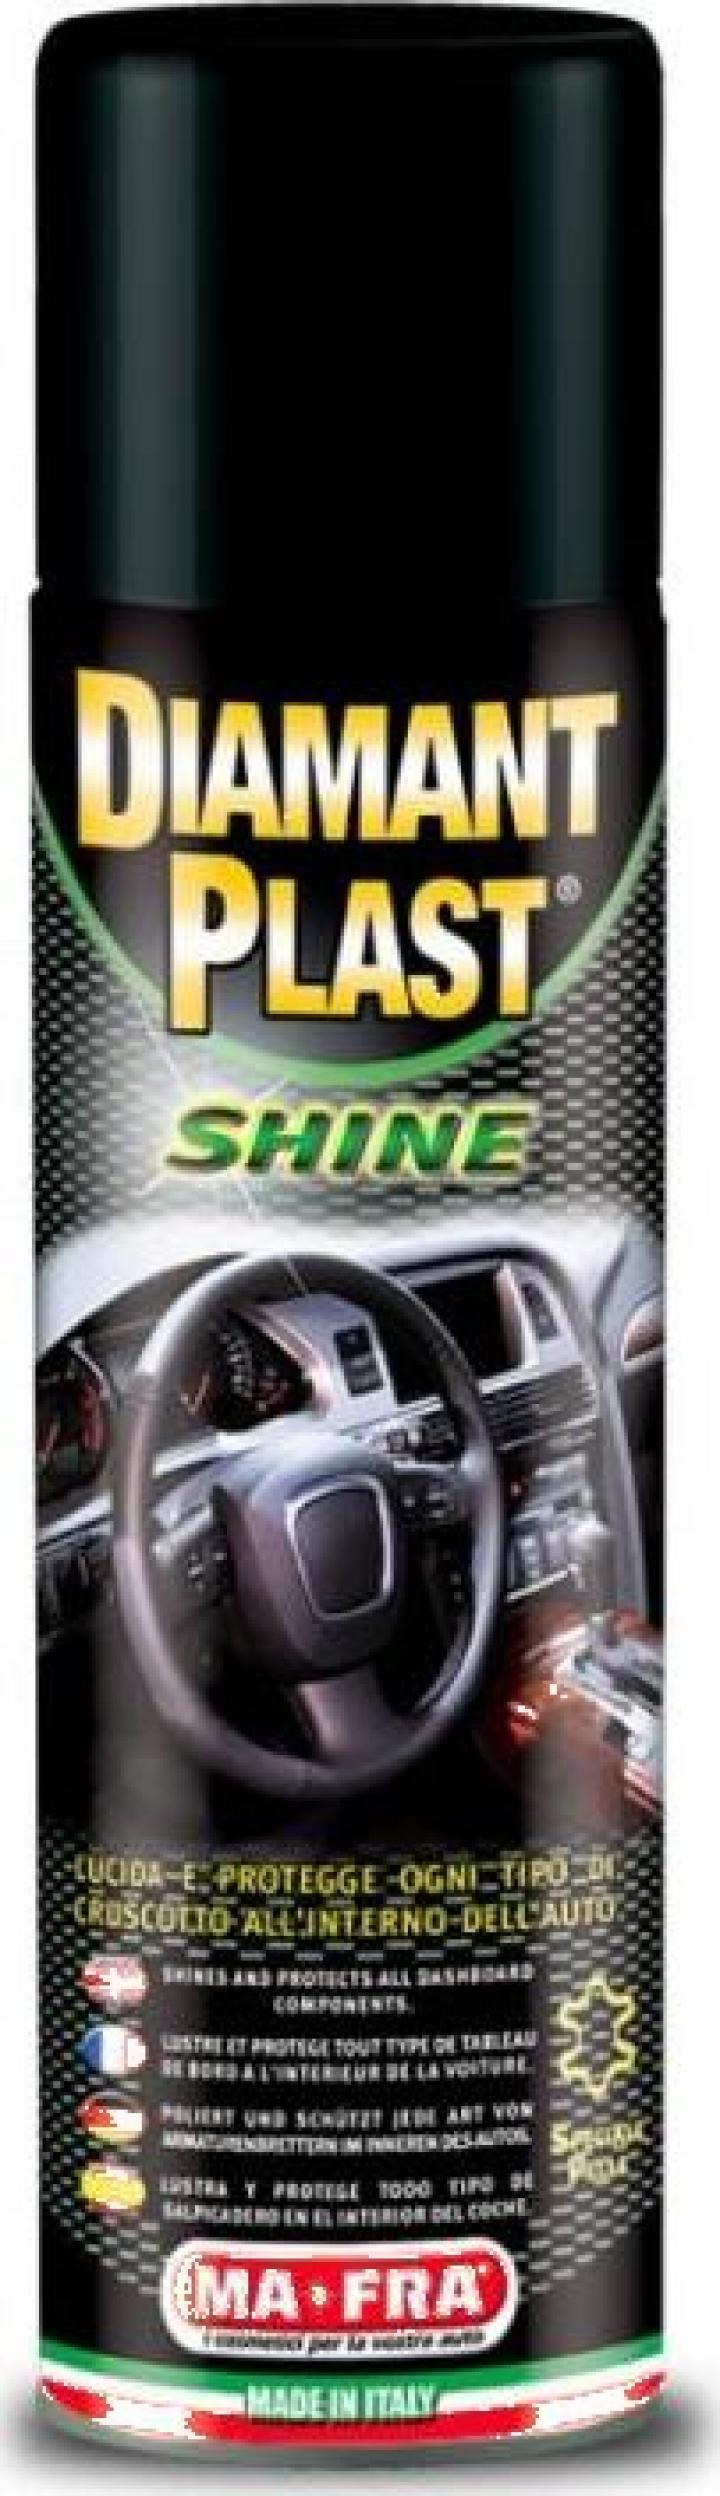 Solutie curatare bord Diamant Plast Shine